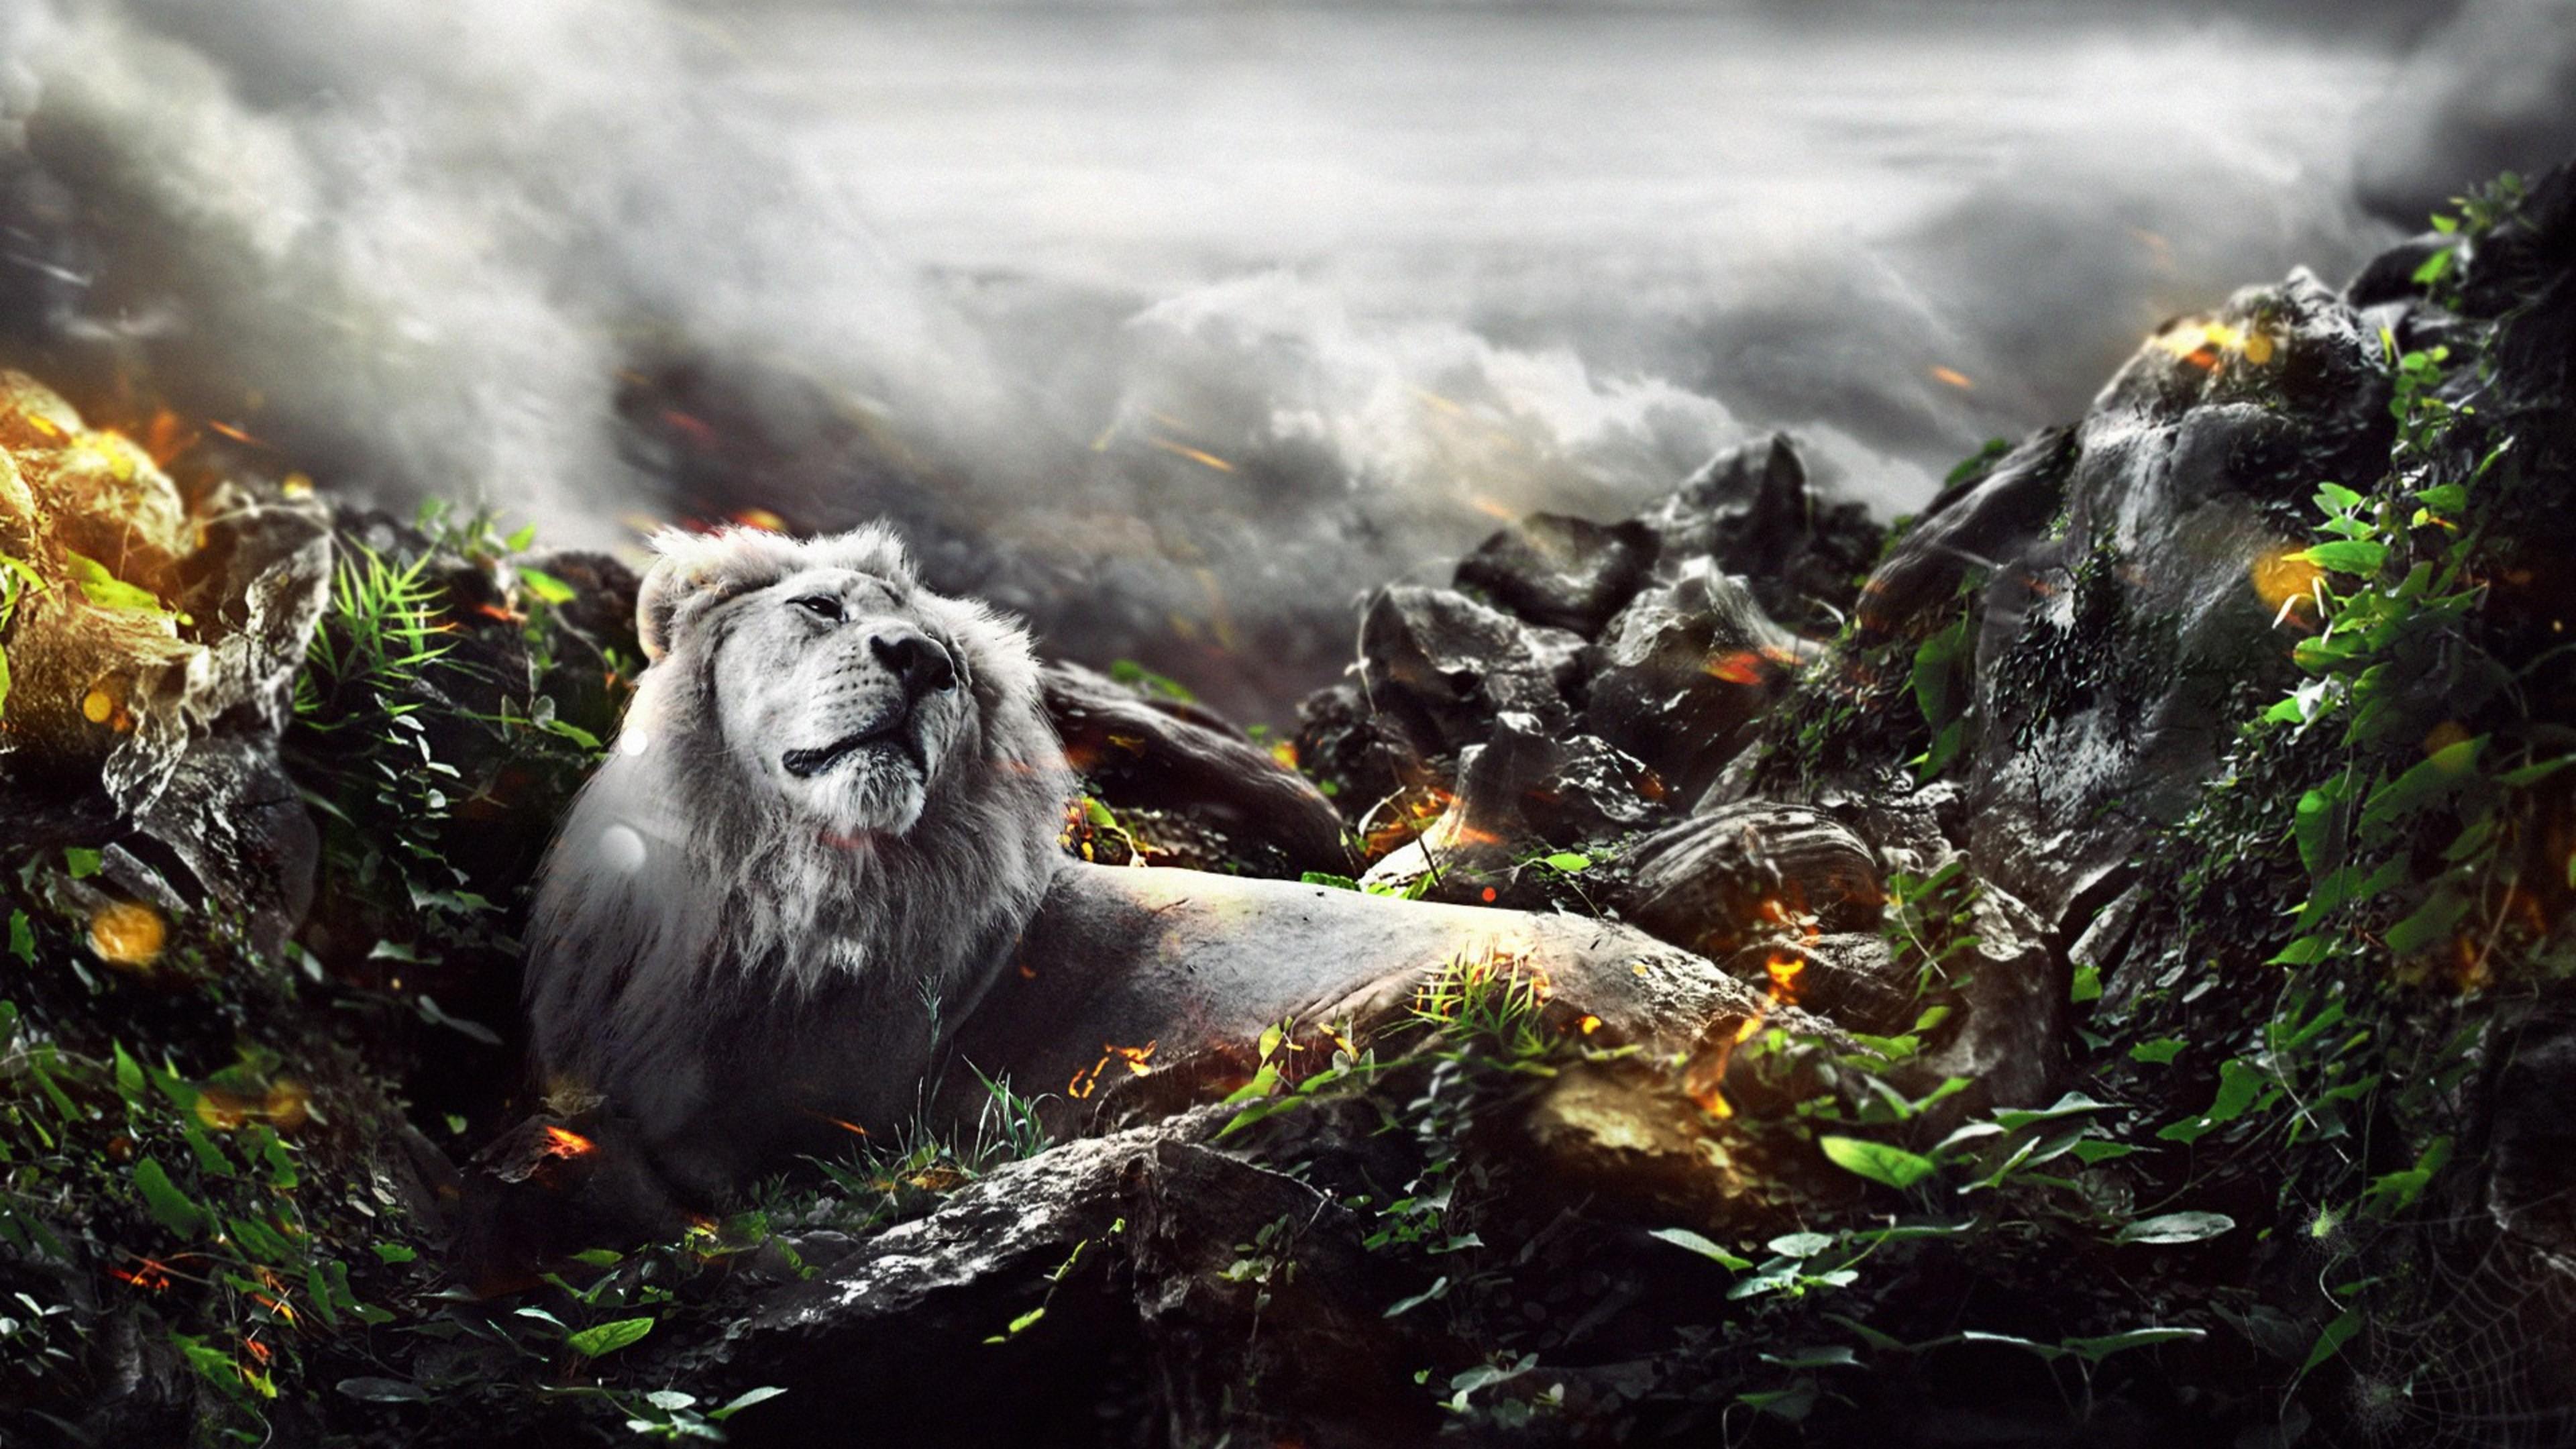 Jungle lion creative hd creative 4k wallpapers images - Lion 4k wallpaper for mobile ...